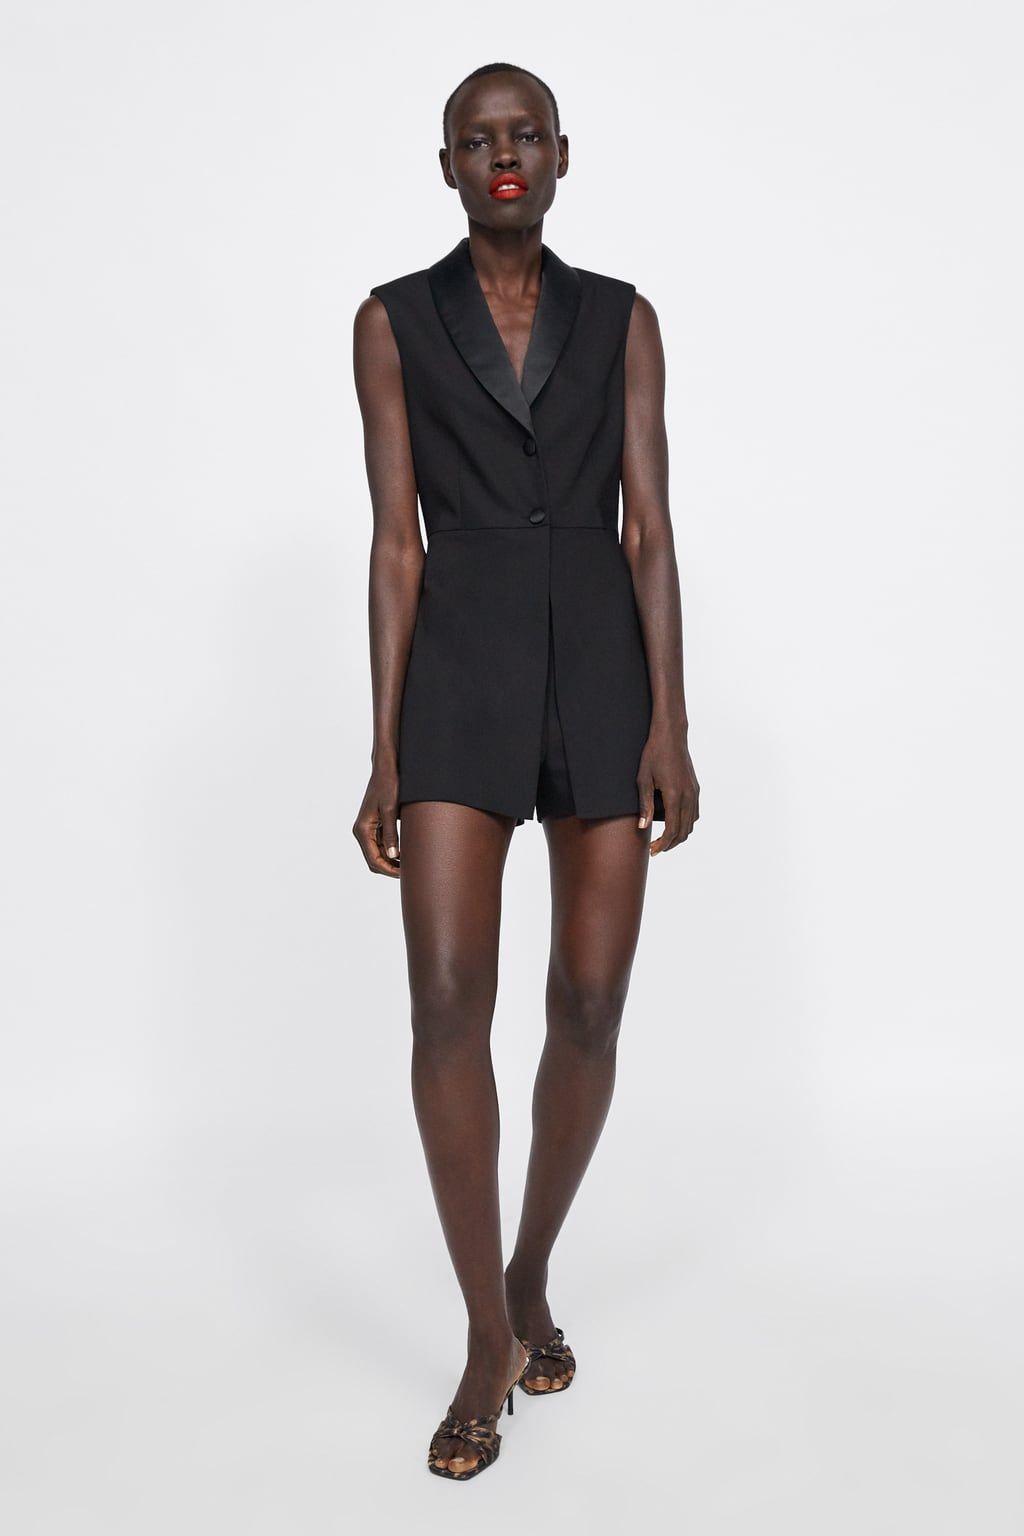 93d93f8613 MONO BLAZER in 2019 | Fashion | Zara jumpsuit, Blazer fashion ...